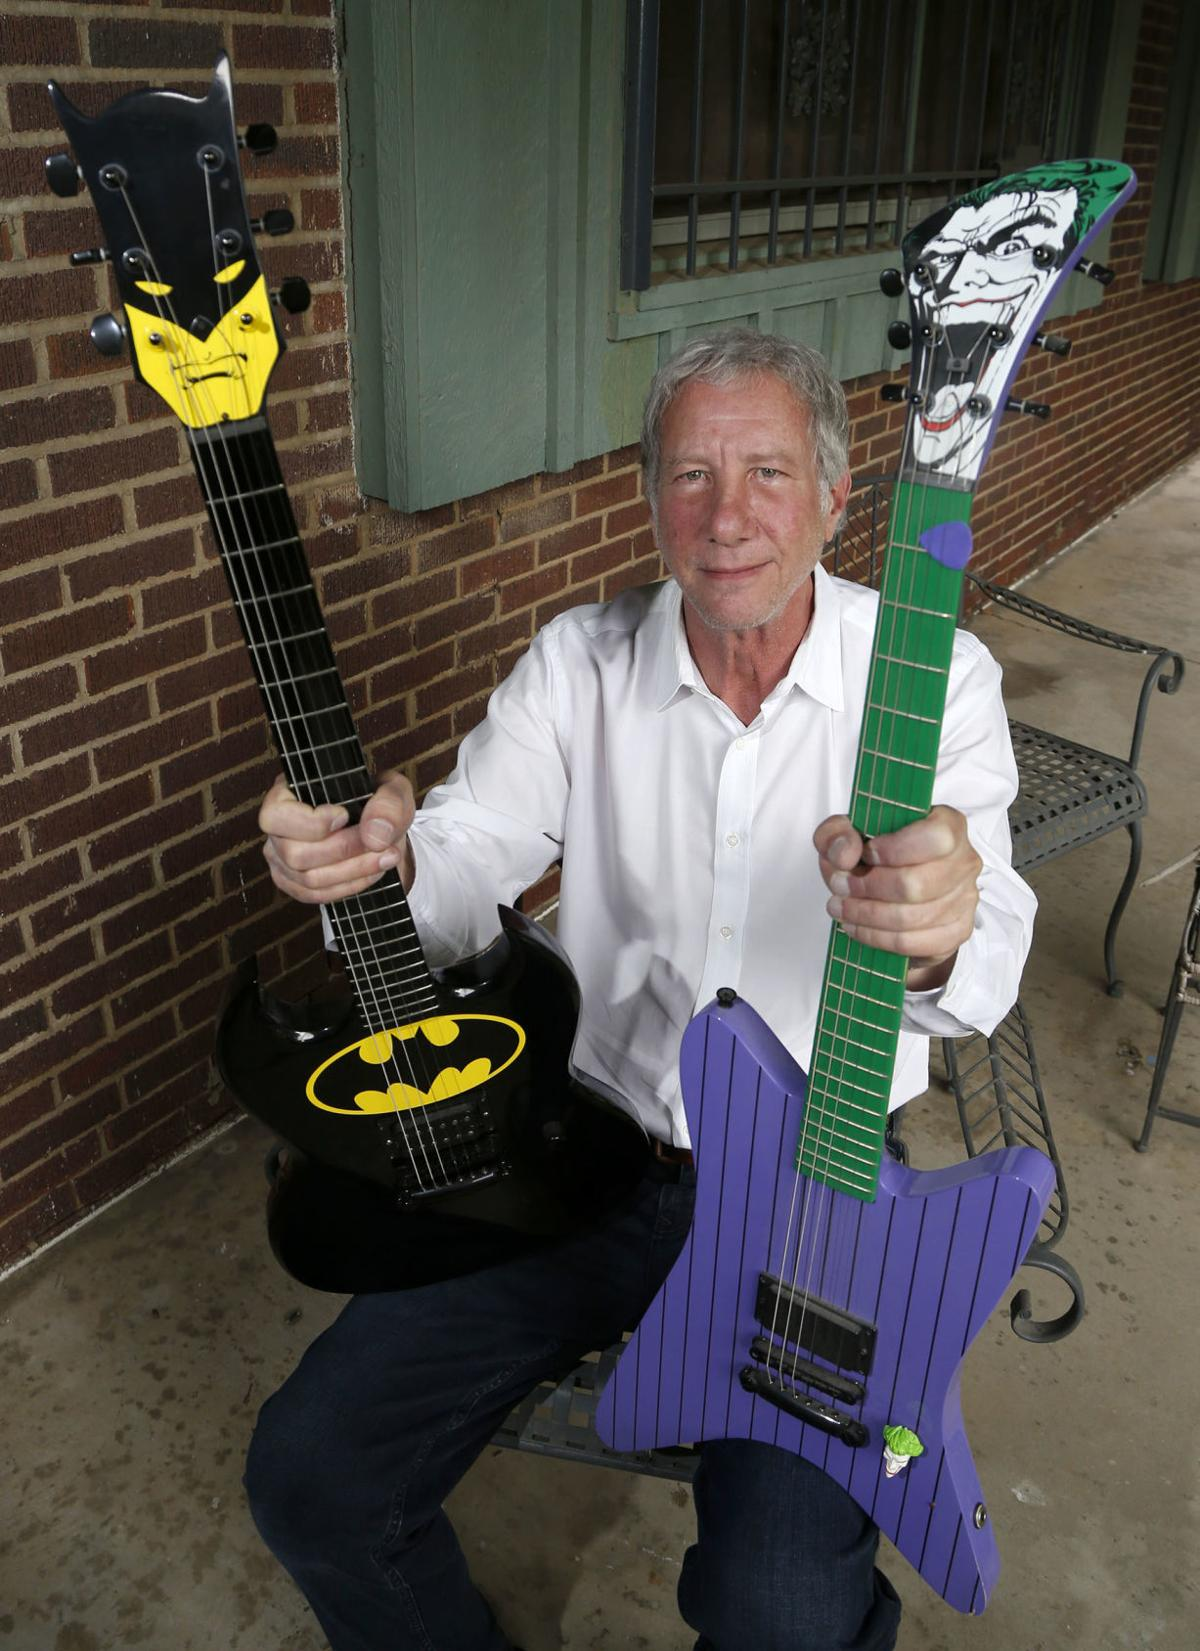 Batman and Joker guitars